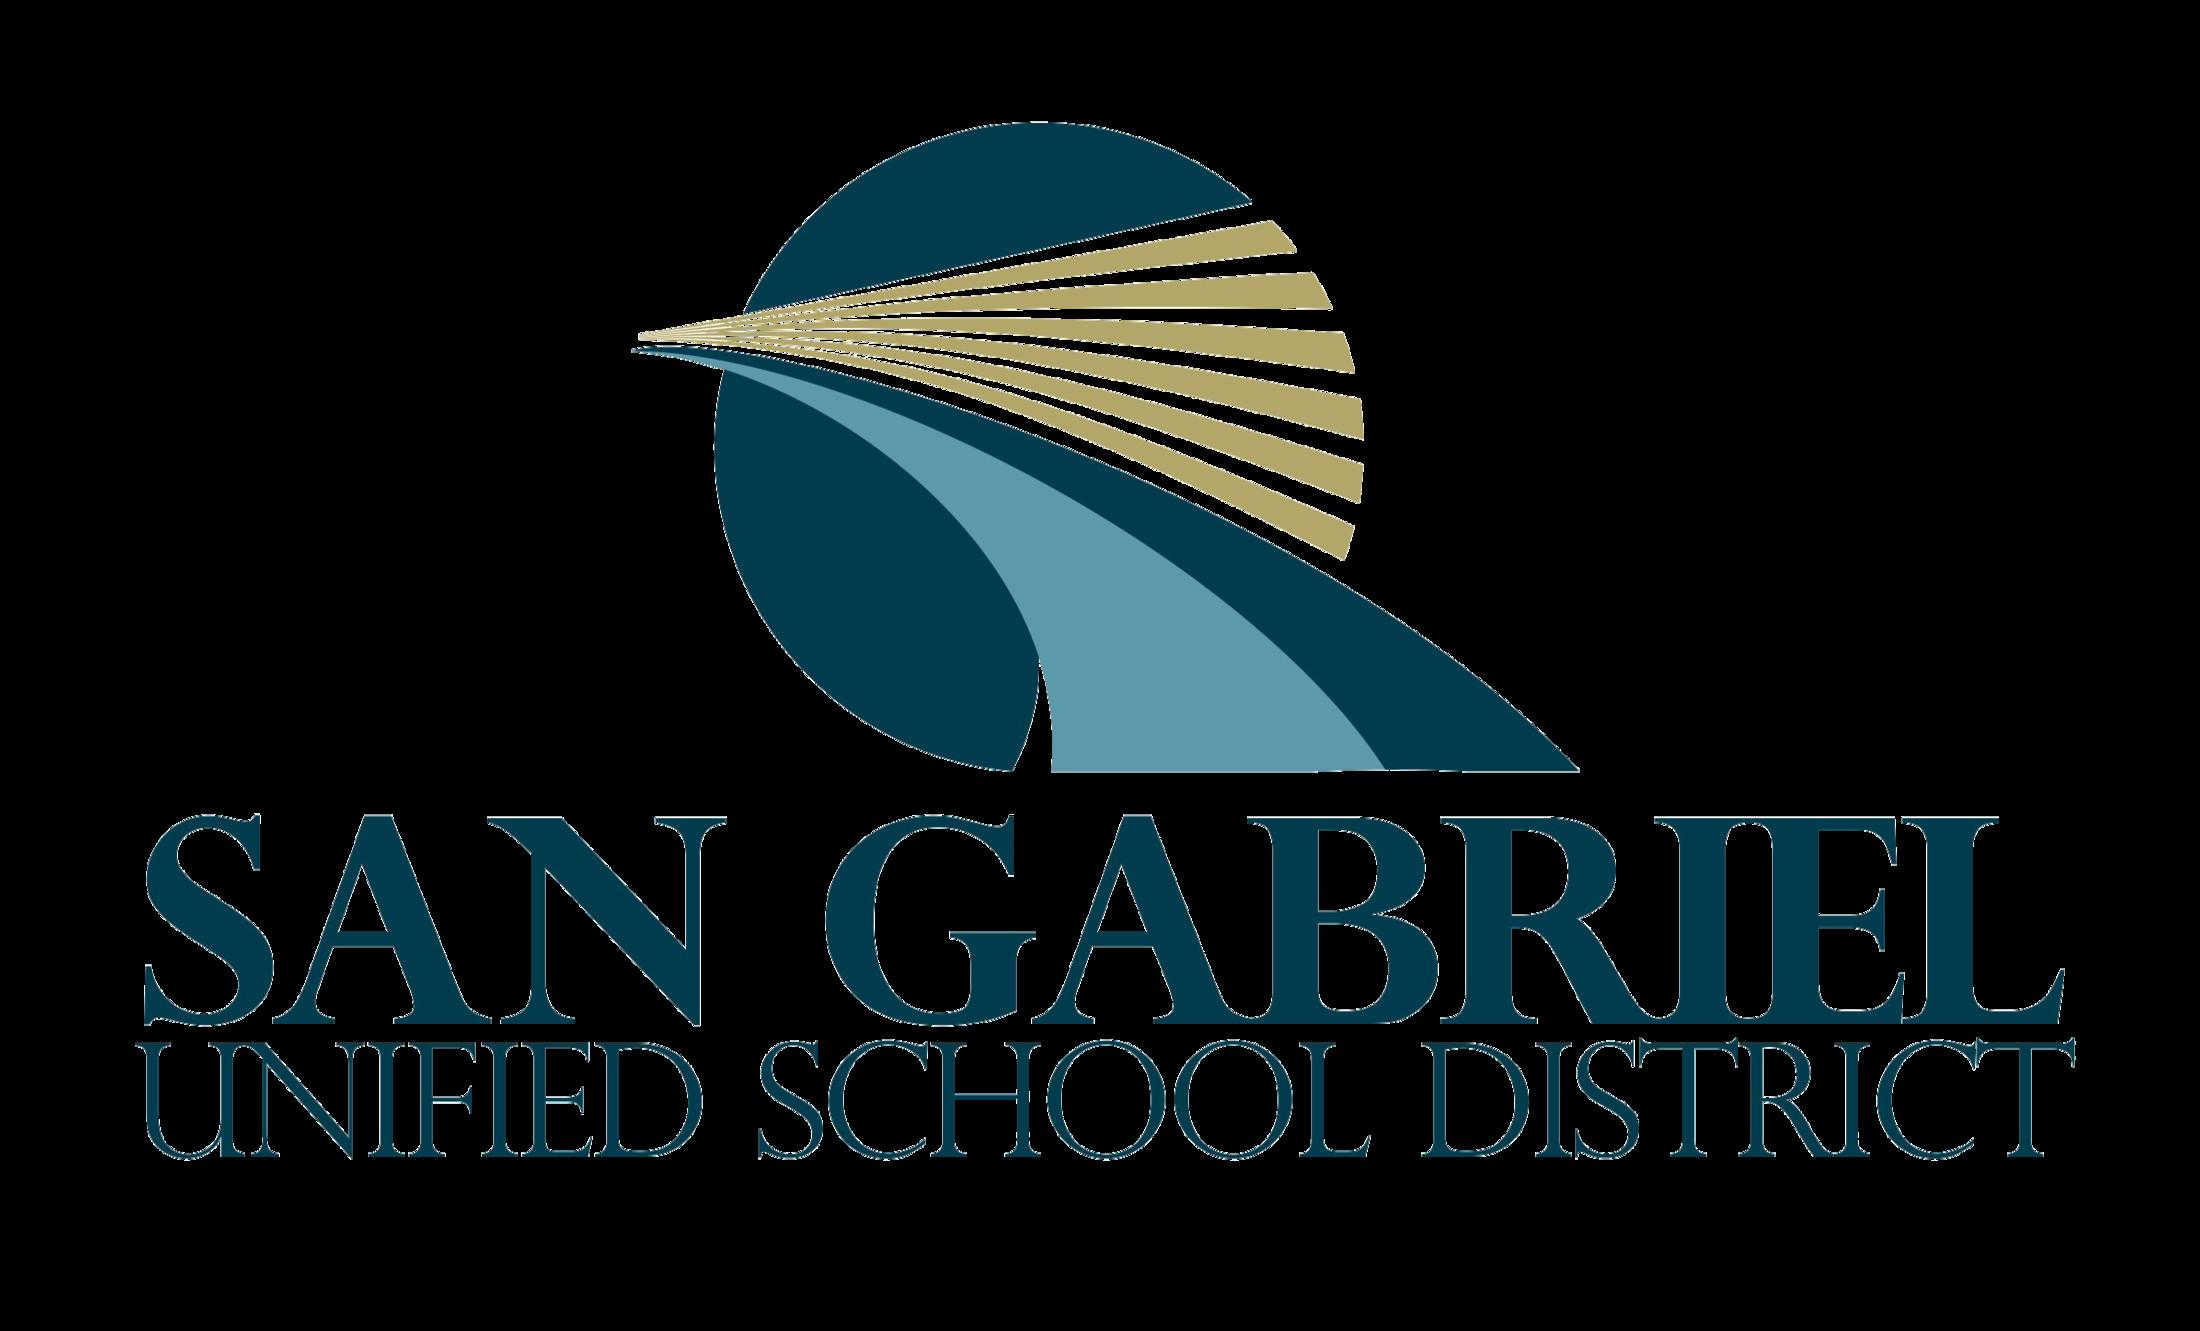 San Gabriel Unified School District